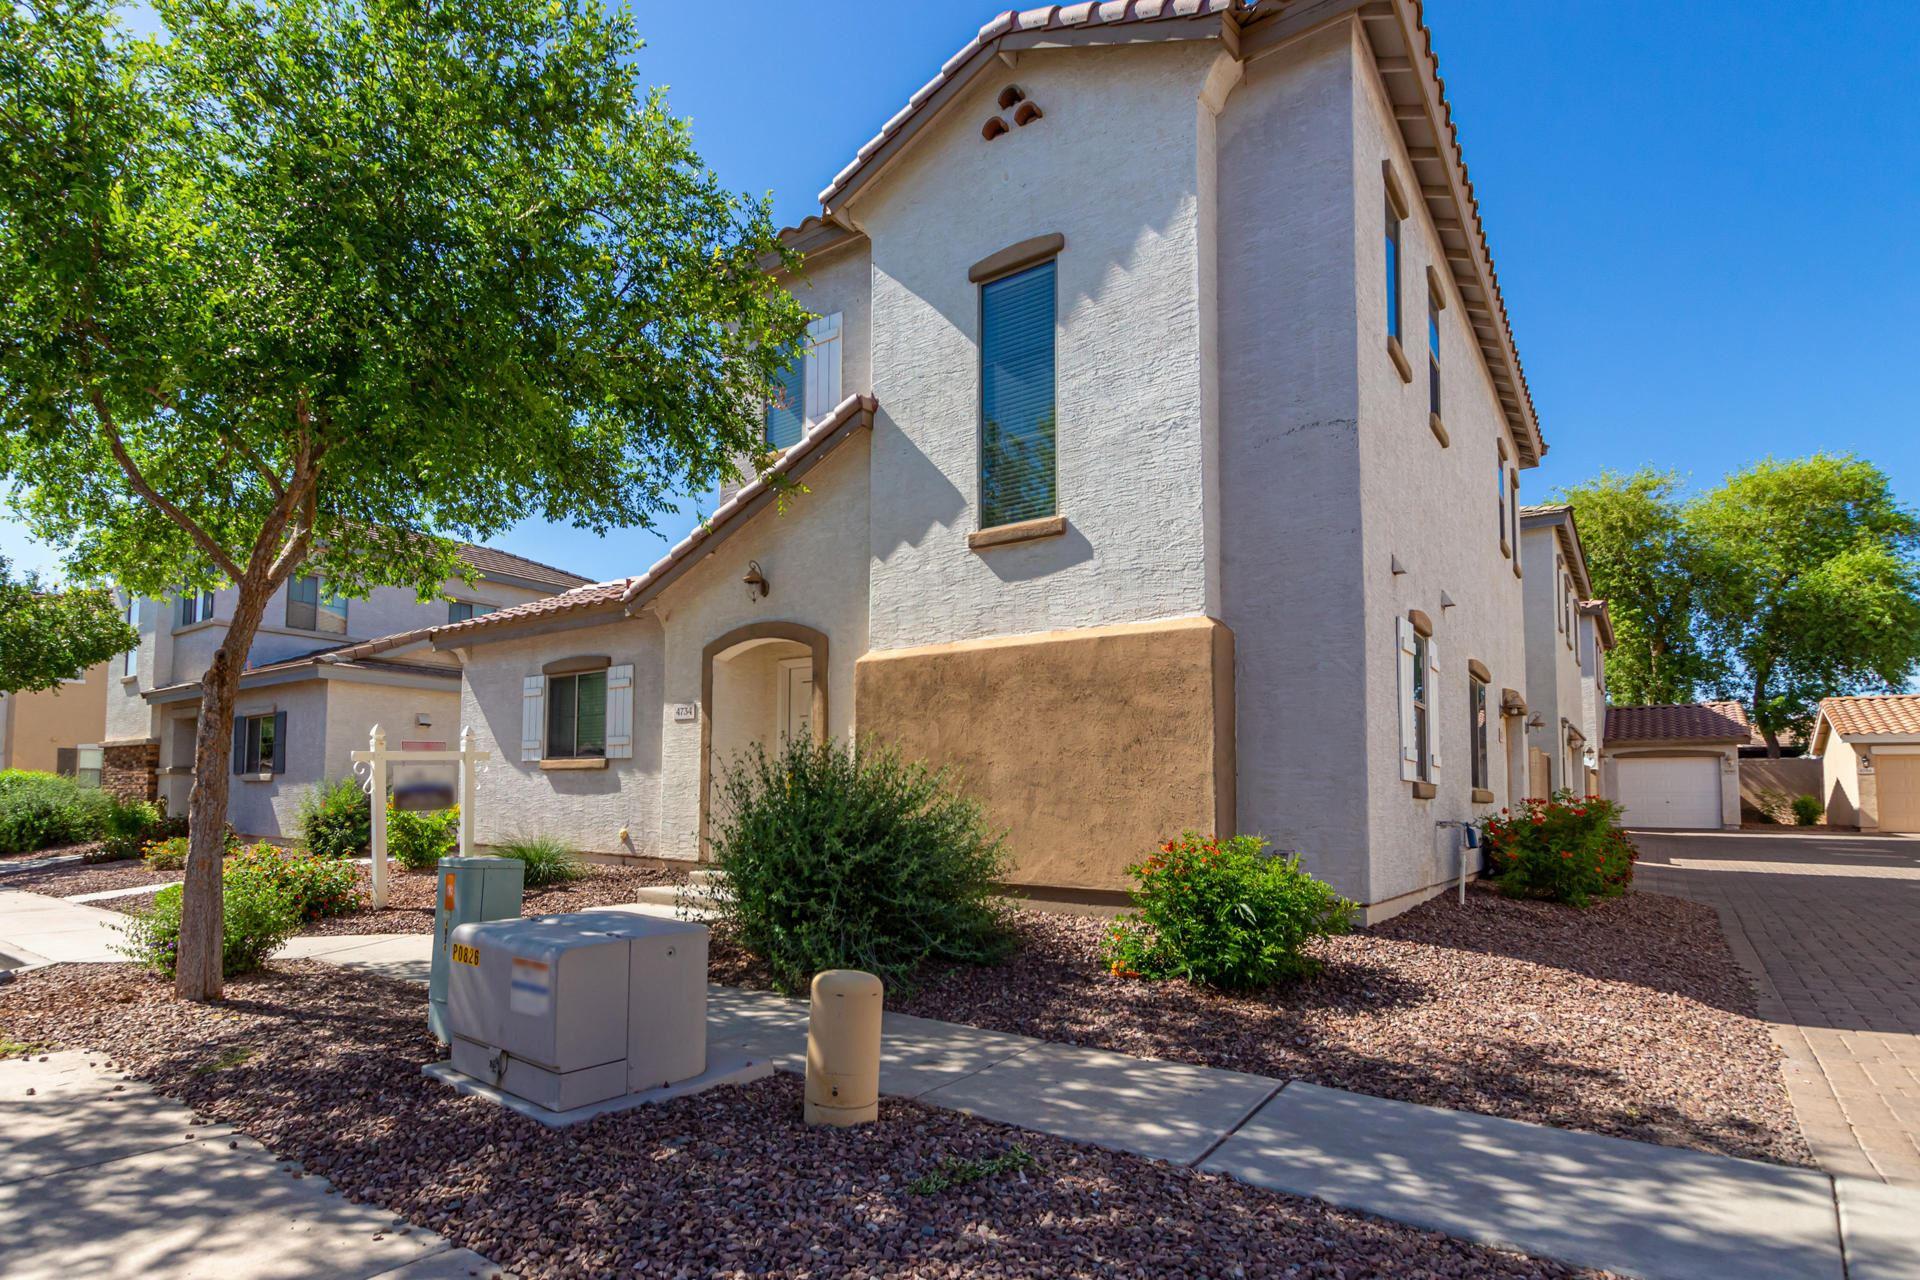 Photo of 4734 E Laurel Avenue, Gilbert, AZ 85234 (MLS # 6232168)